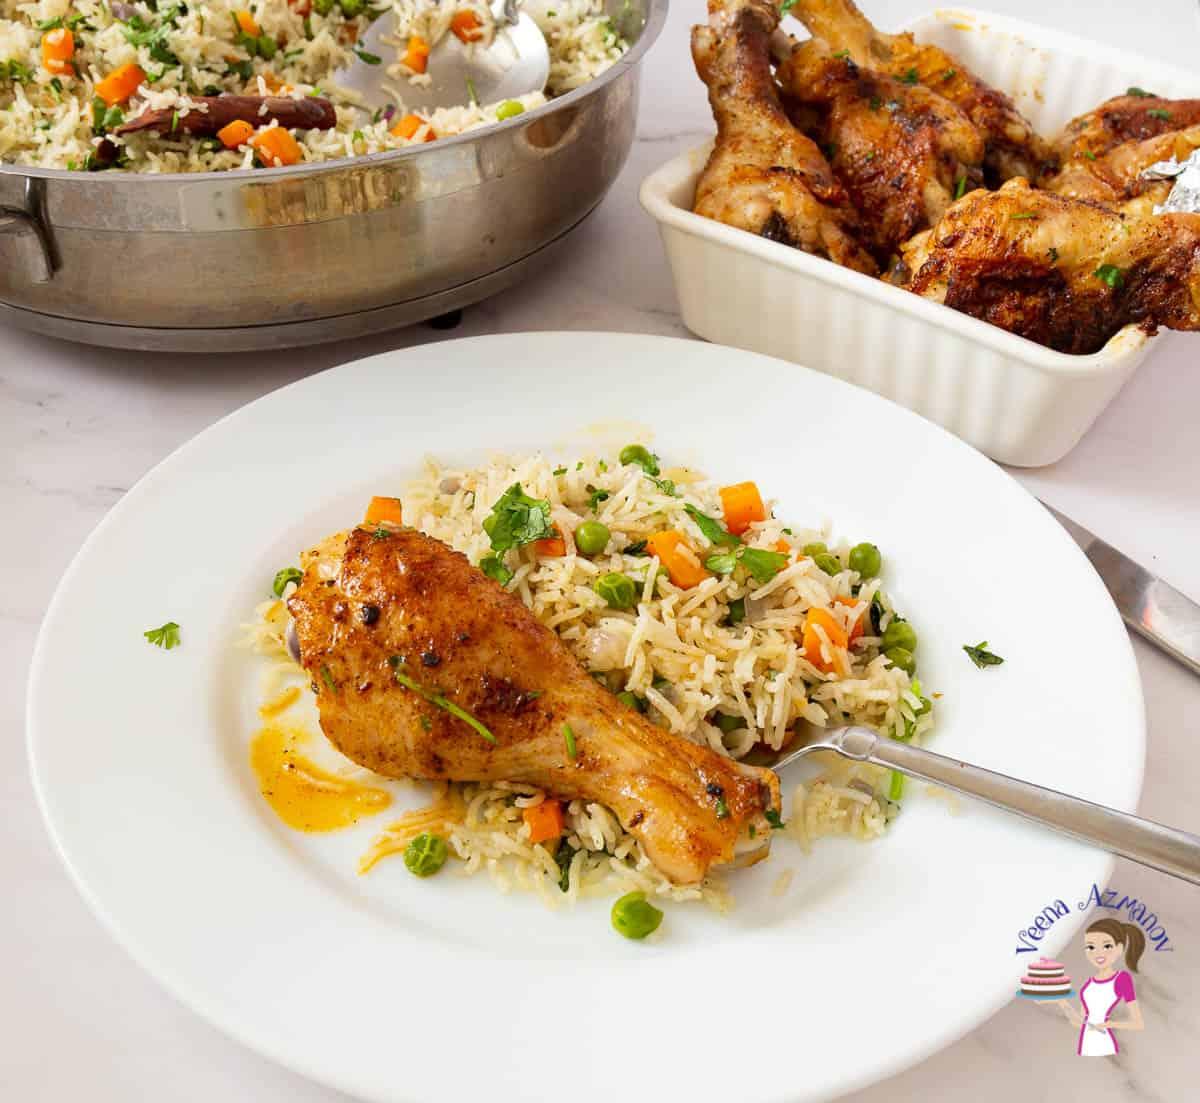 A chicken leg on rice pilaf